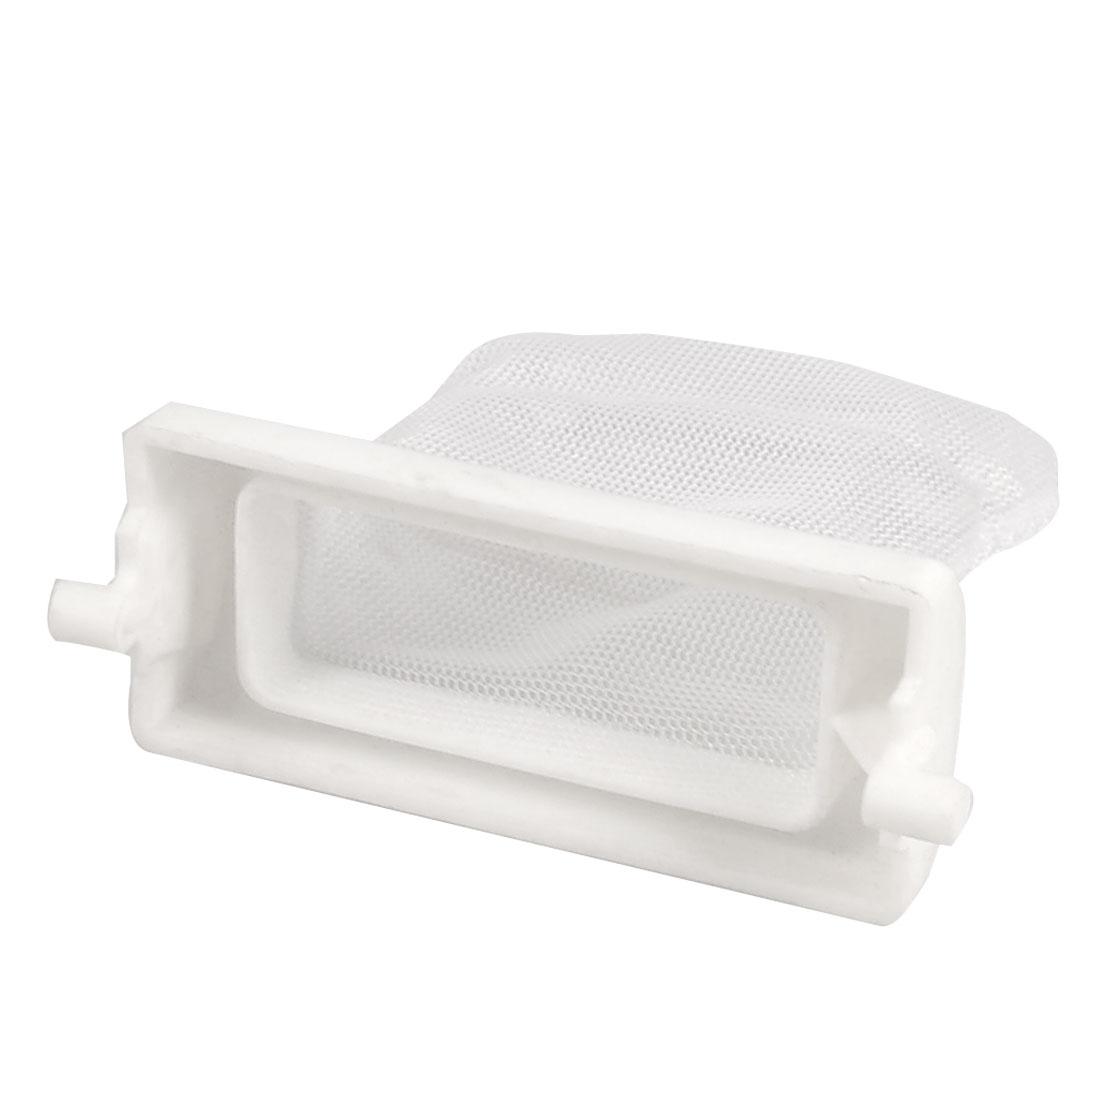 Washing Machine White Plastic Nylon Filter 6.5cm x 6cm Meshy Bag